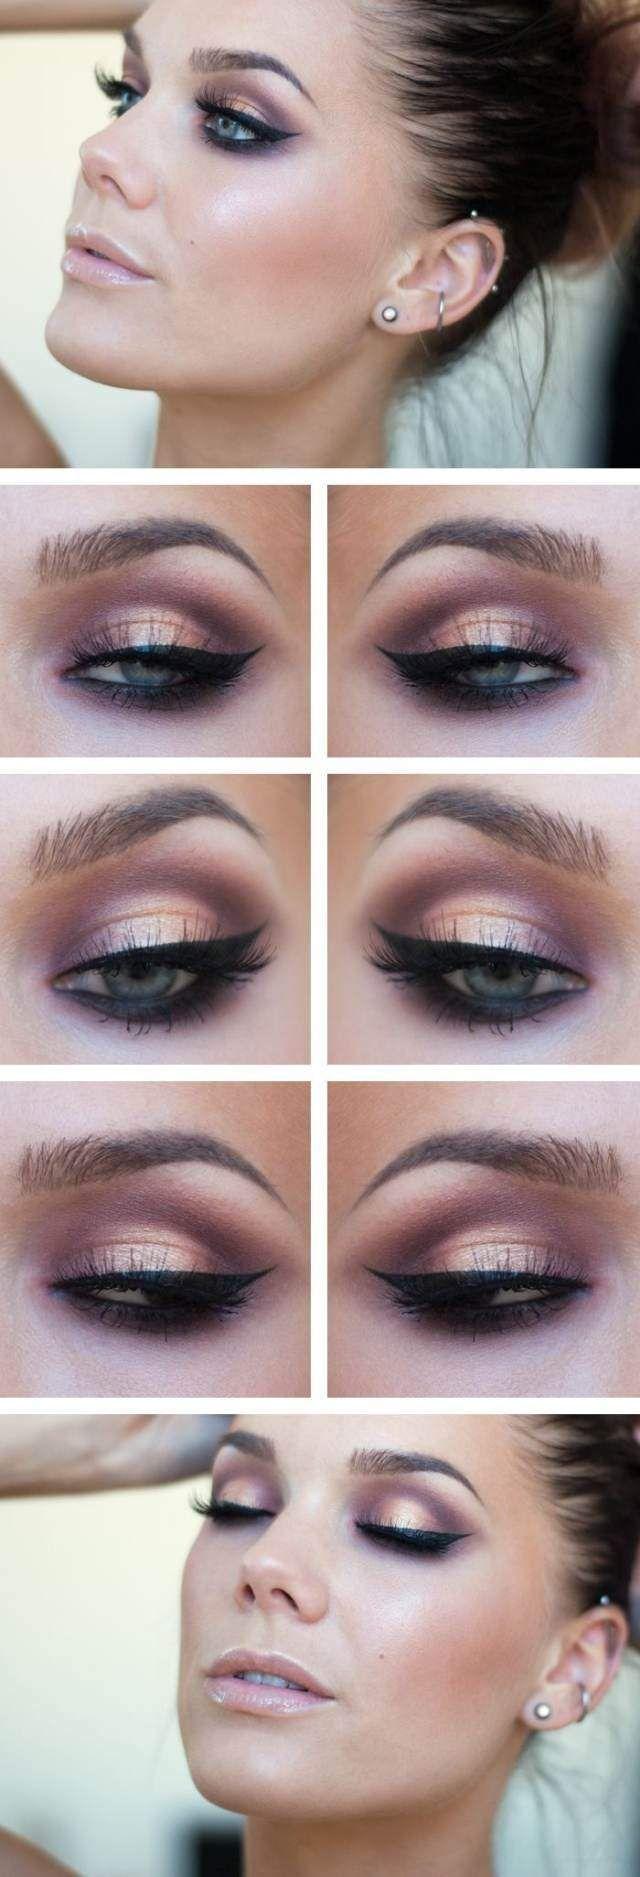 tuto maquillage yeux 28 belles photos et id es imiter eye liner pais beau maquillage des. Black Bedroom Furniture Sets. Home Design Ideas